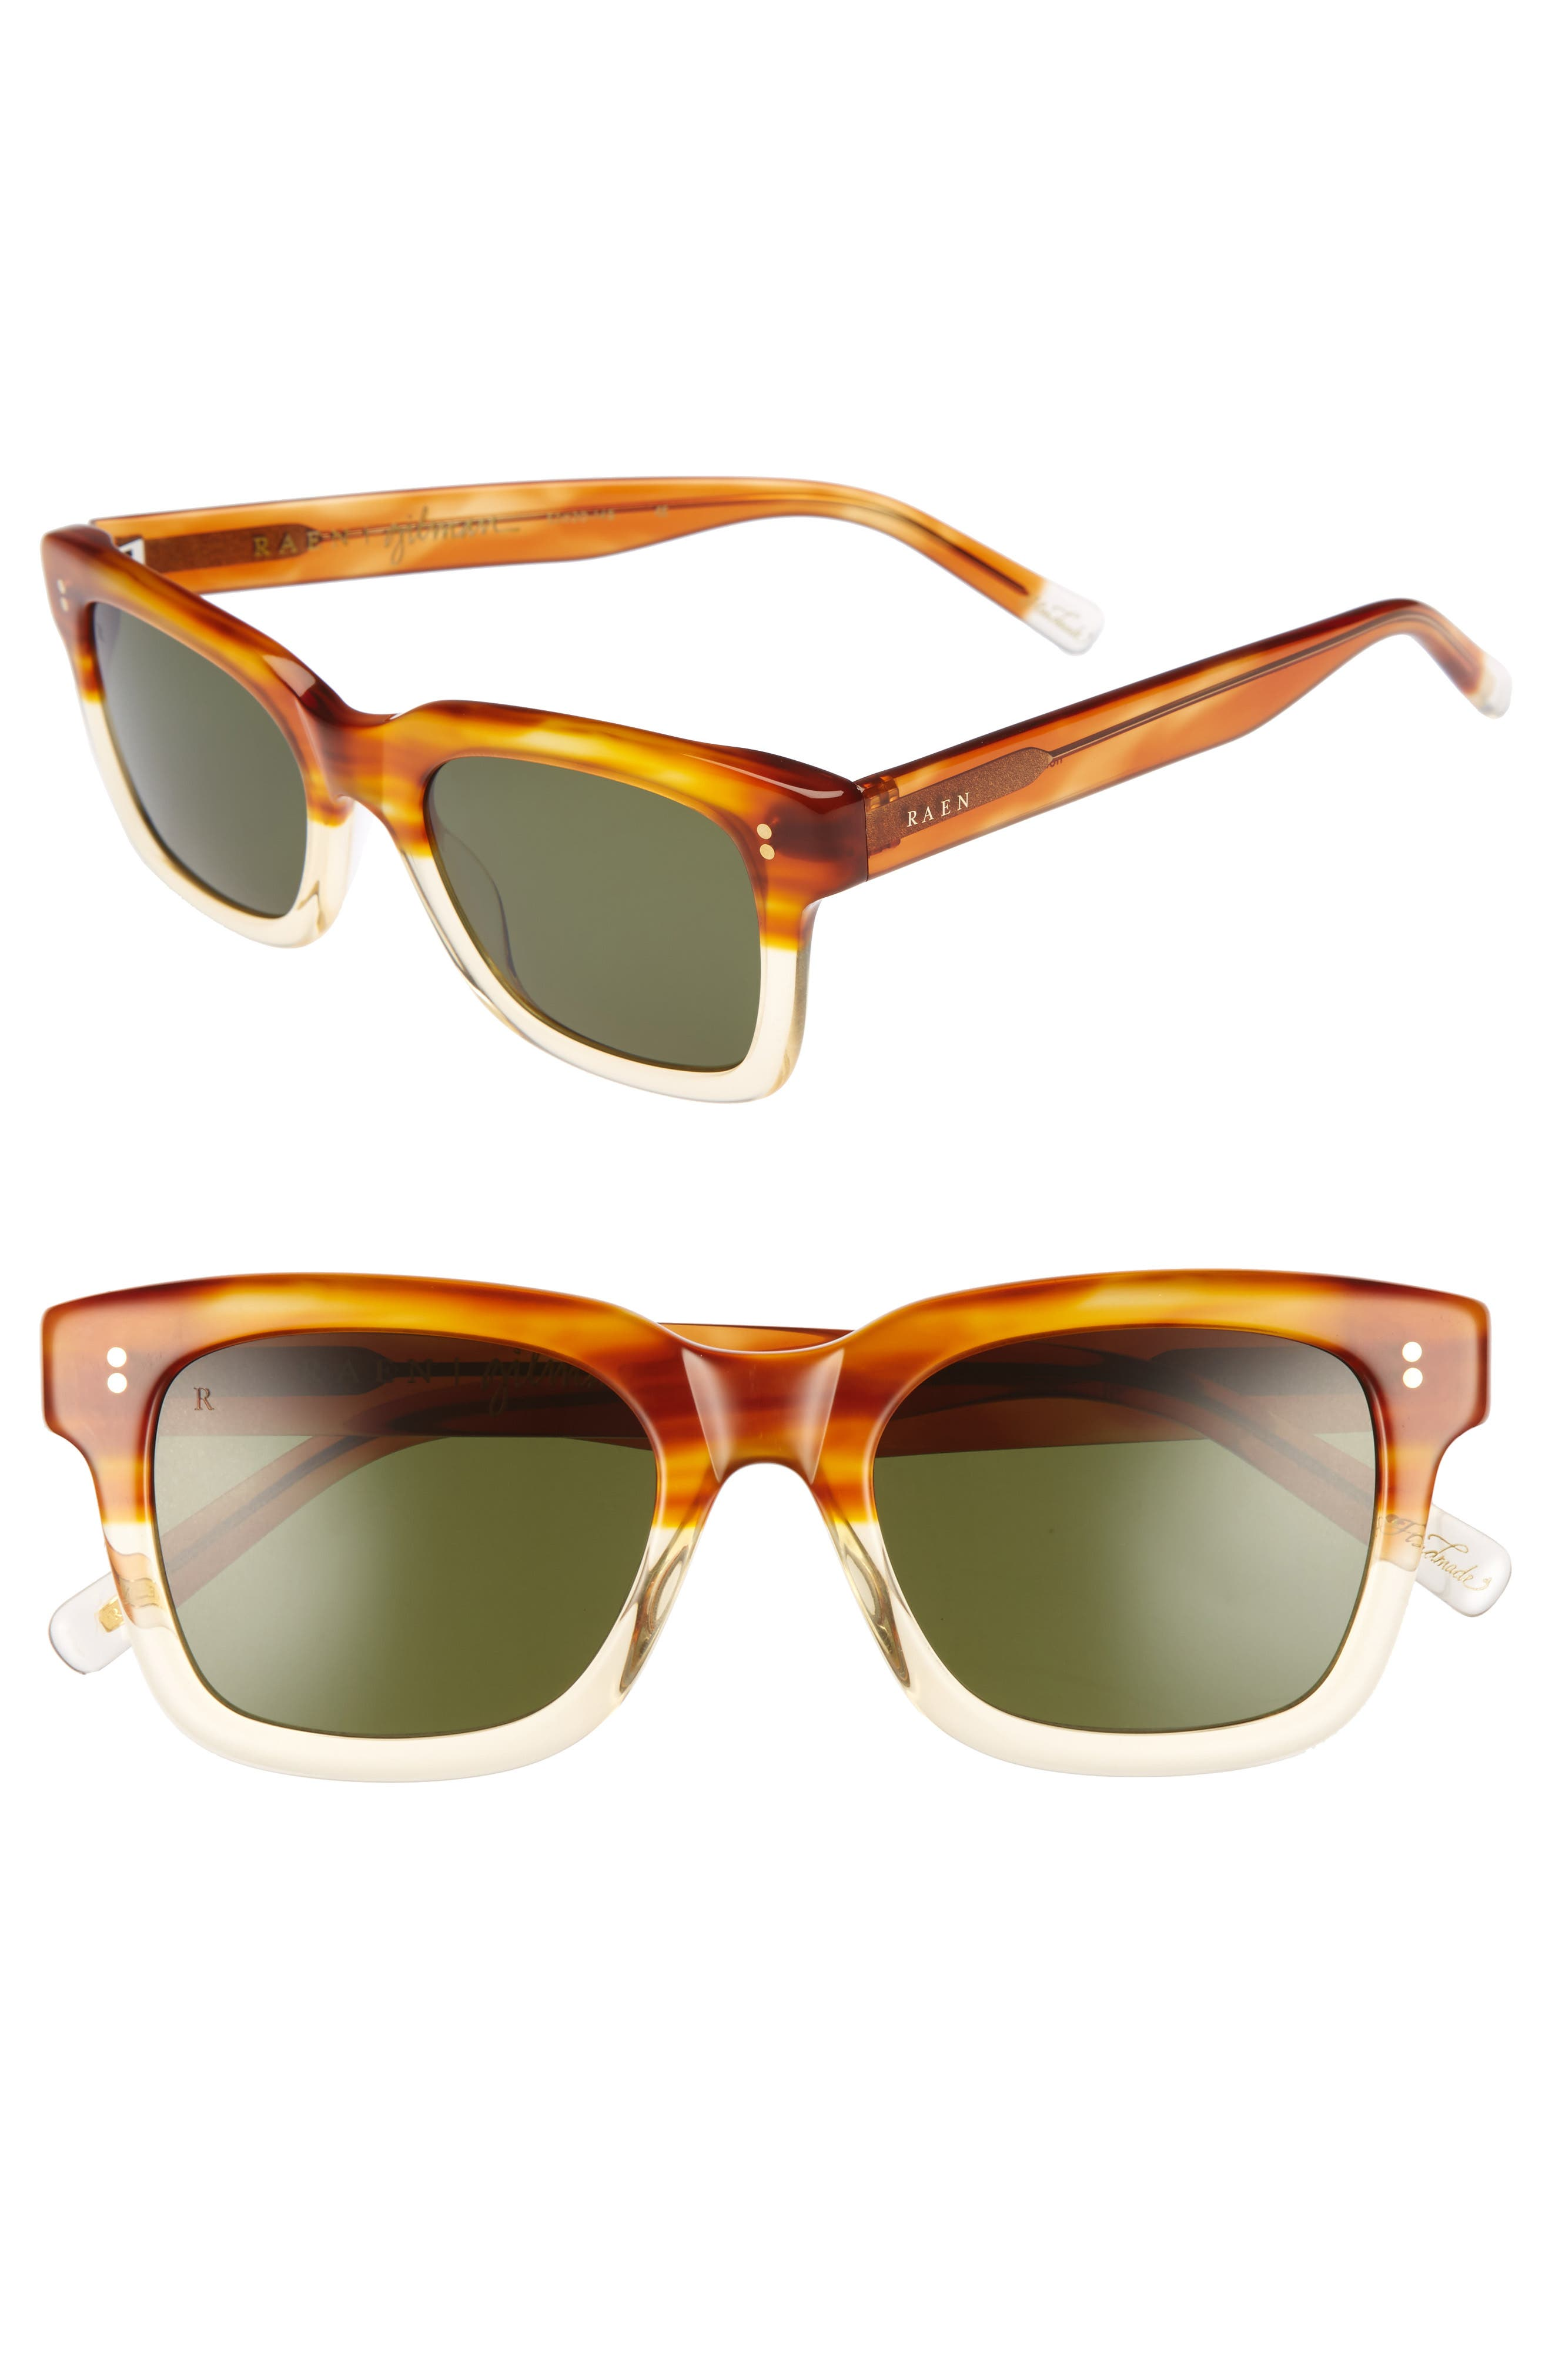 Gilman 52mm Polarized Sunglasses,                         Main,                         color, Honey Havana/ Green